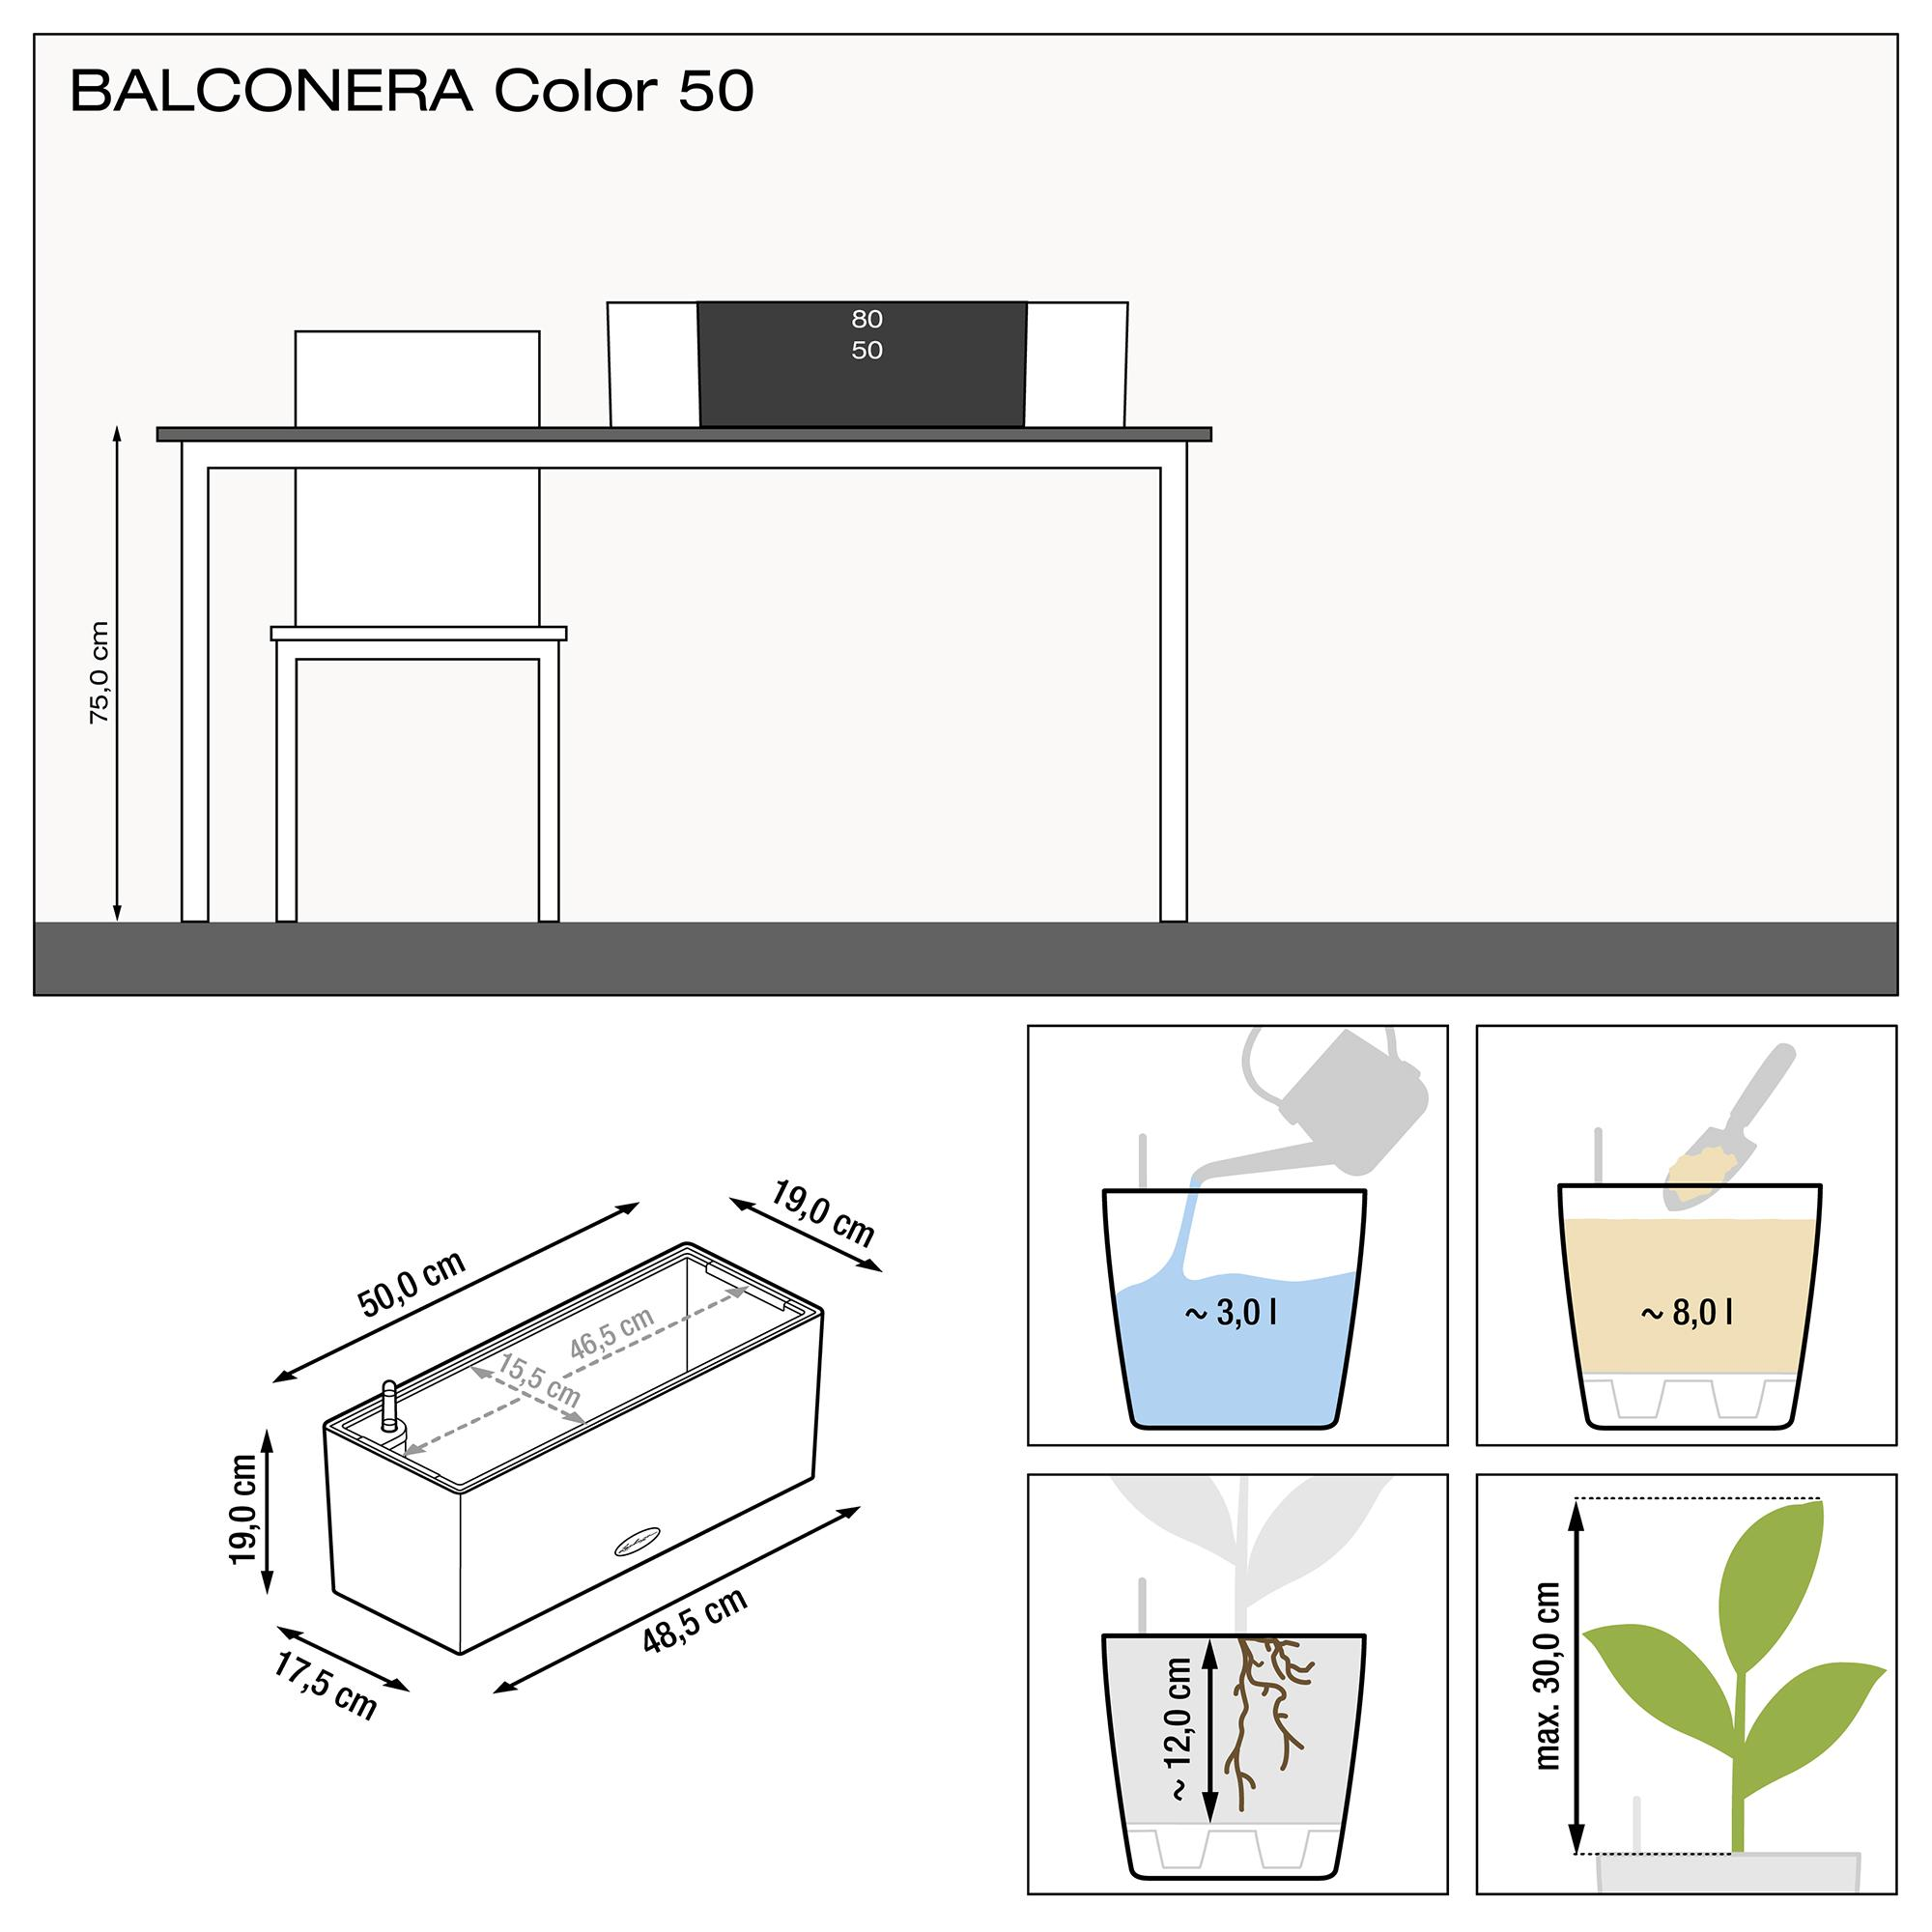 BALCONERA Cottage 50 granite - Image 3